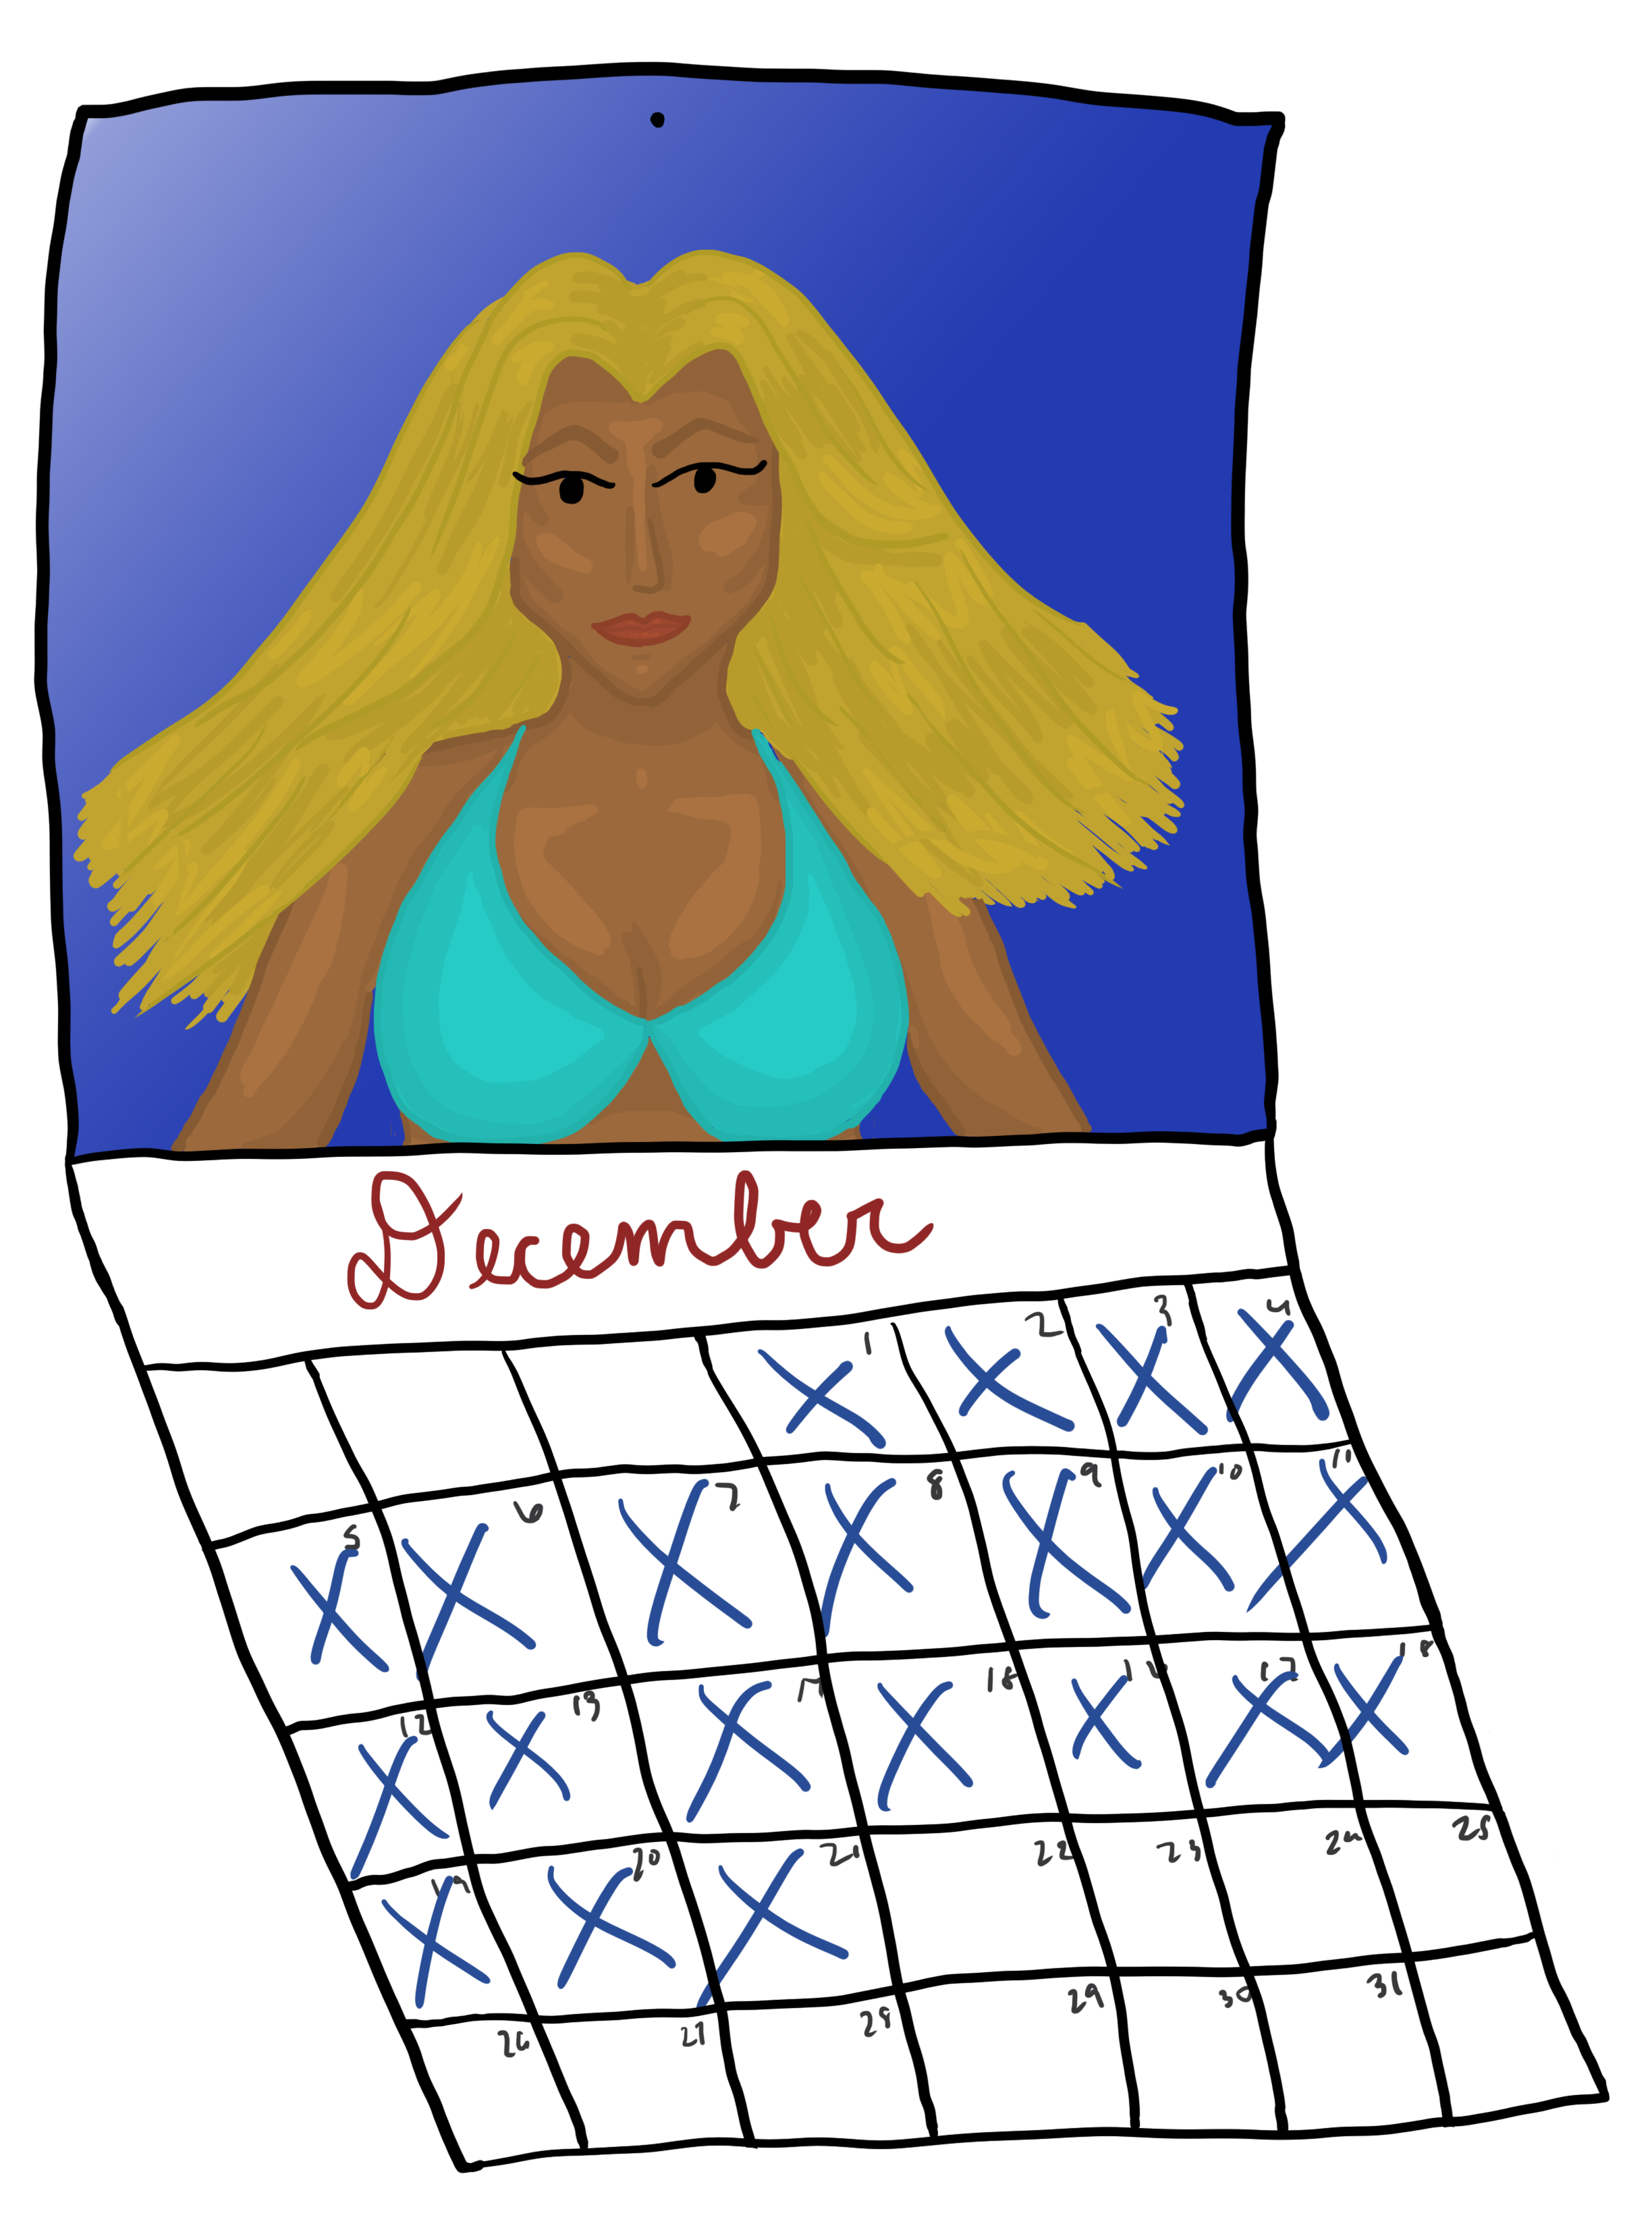 trace_calendar.png